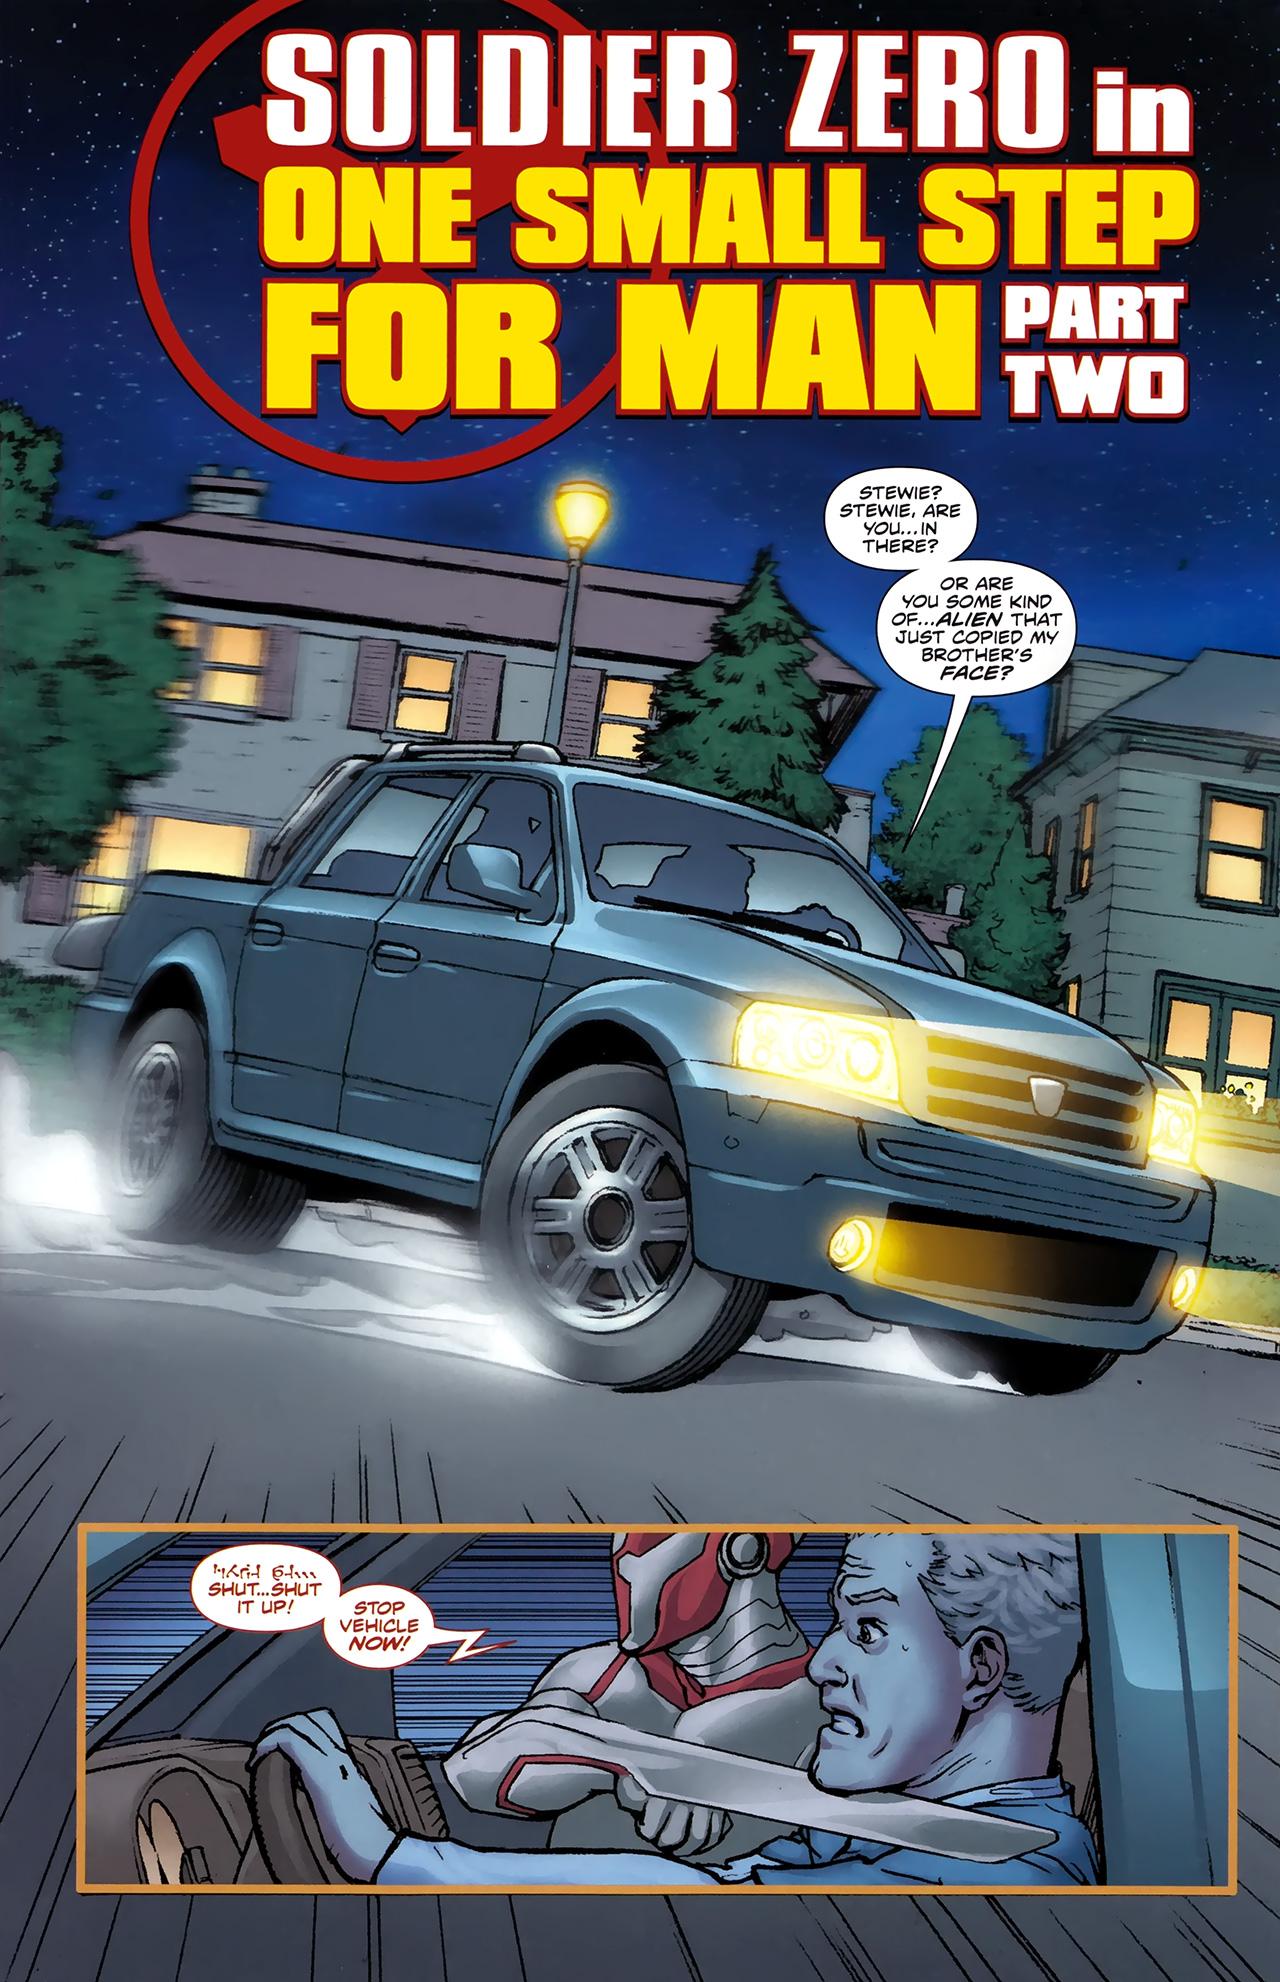 Read online Soldier Zero comic -  Issue #2 - 4